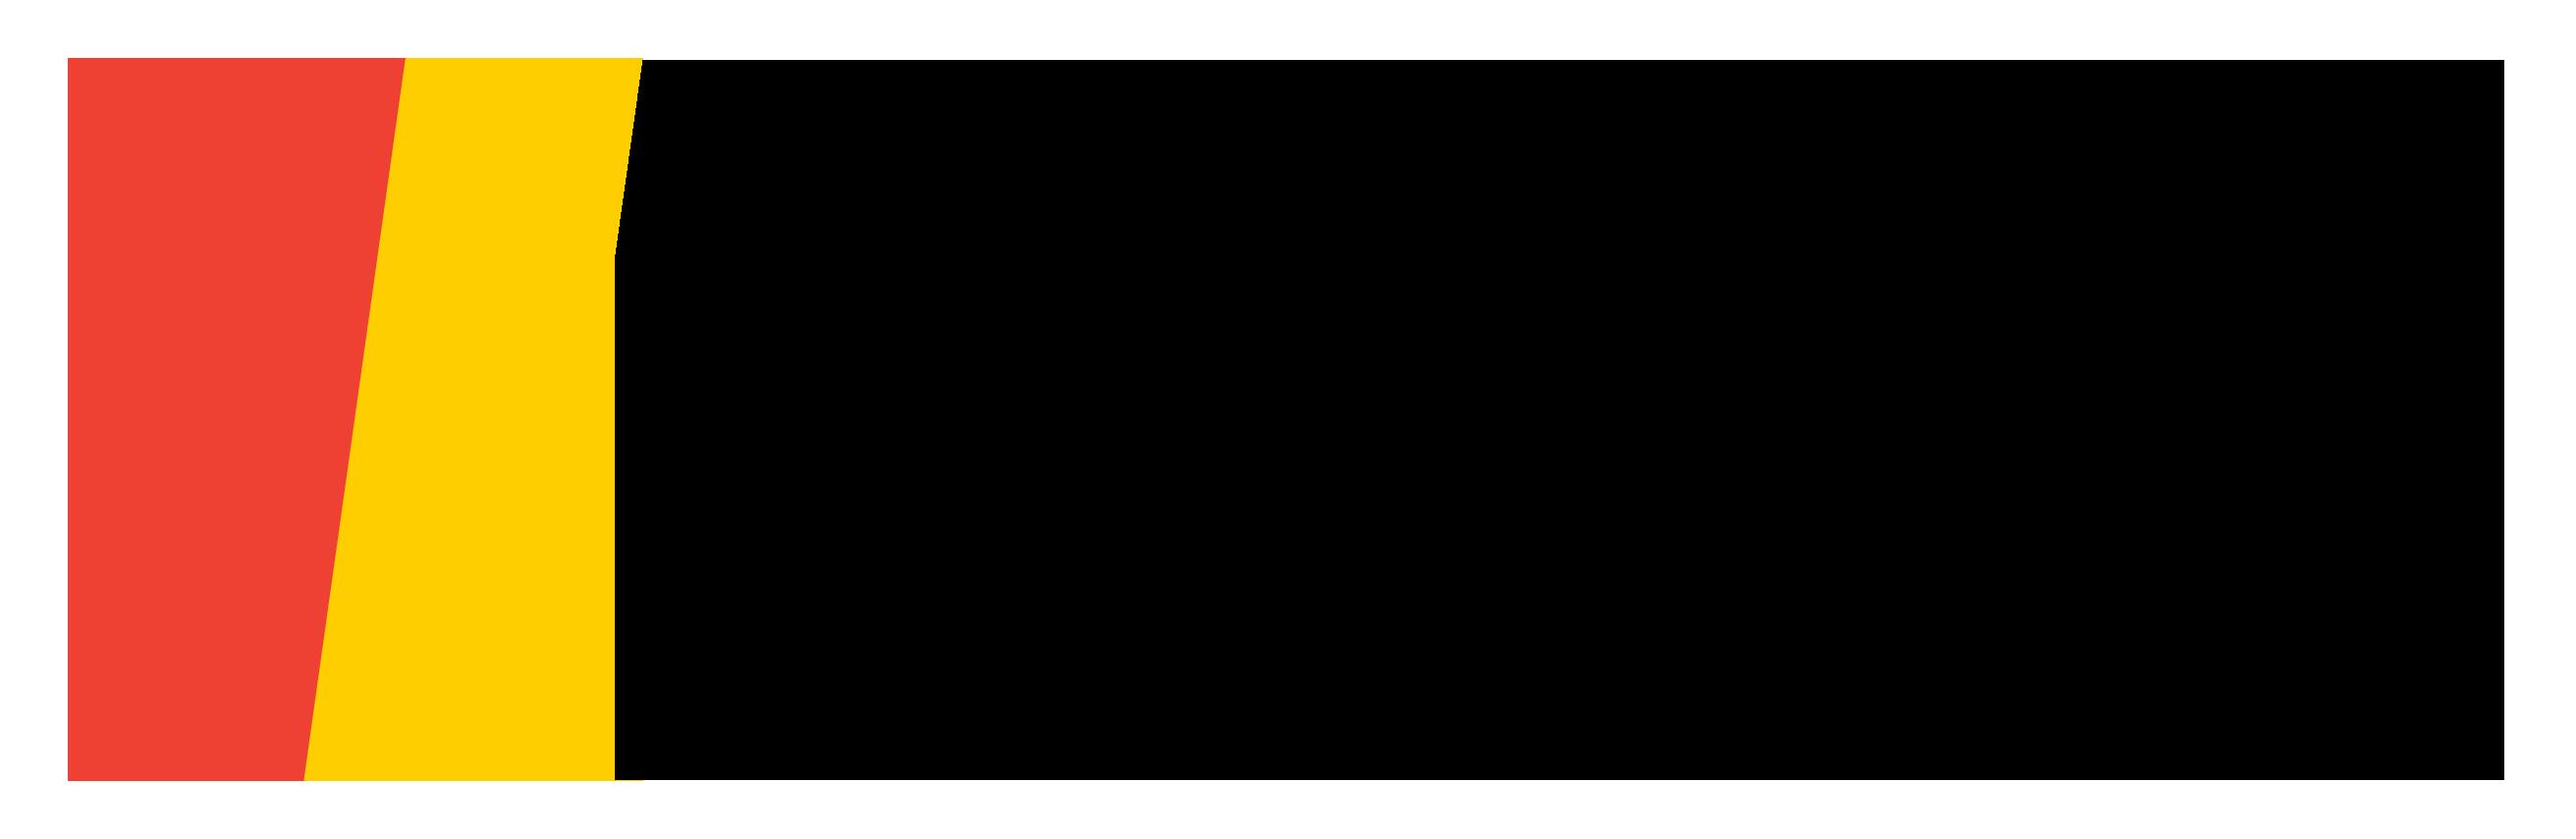 Langley-Logo-Black